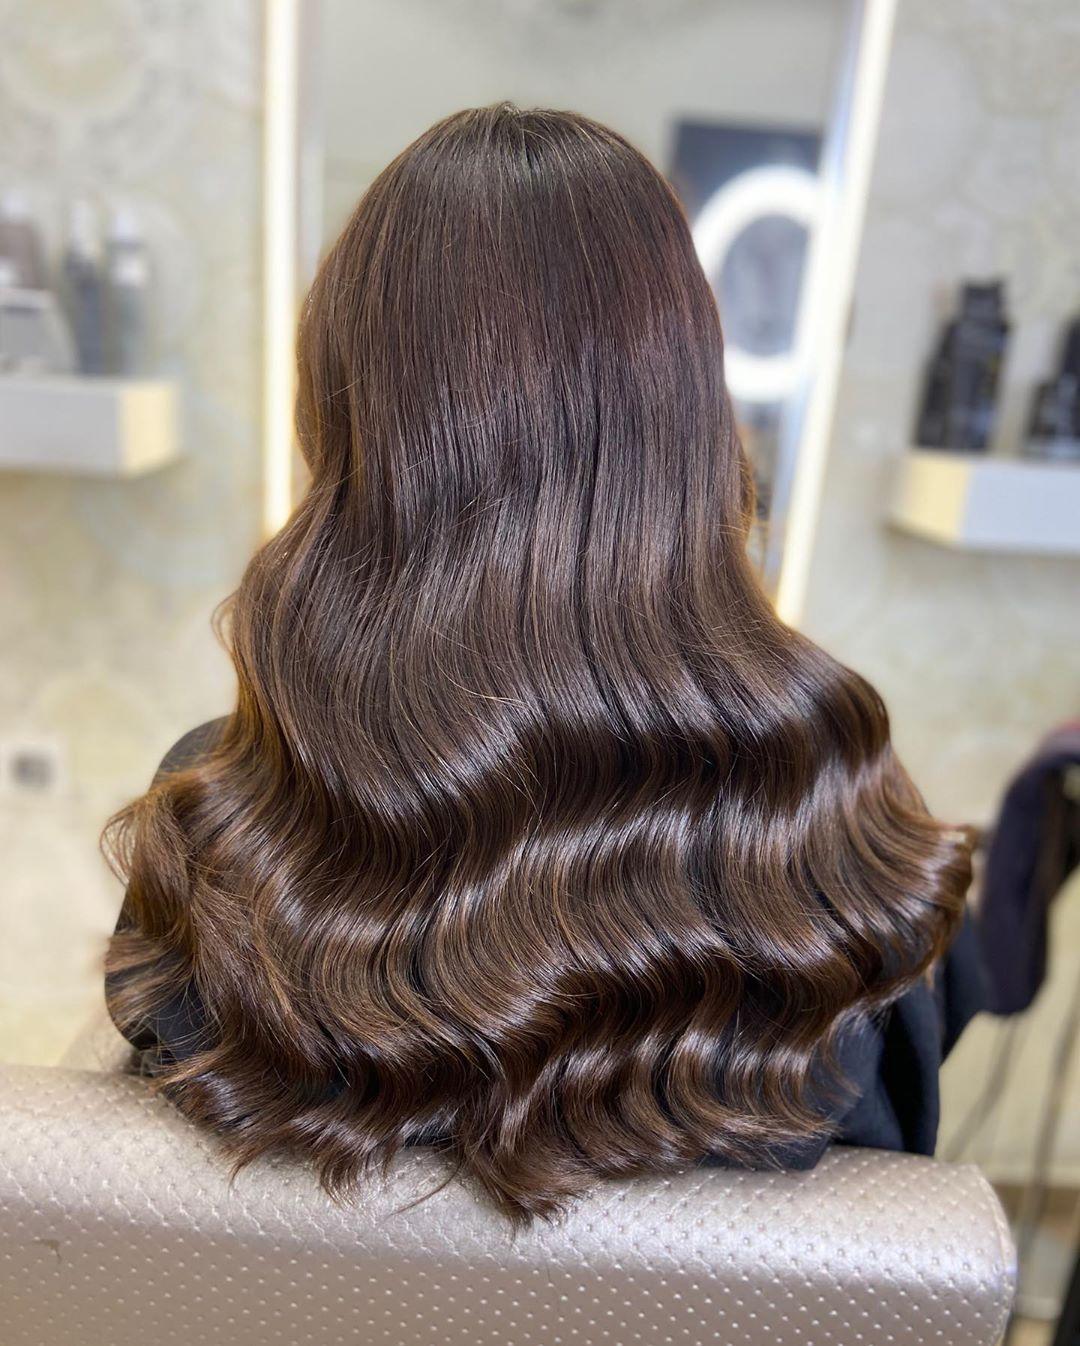 Foto 23 de Salón de peluquería y estética en  | Salón de Belleza David Danielle